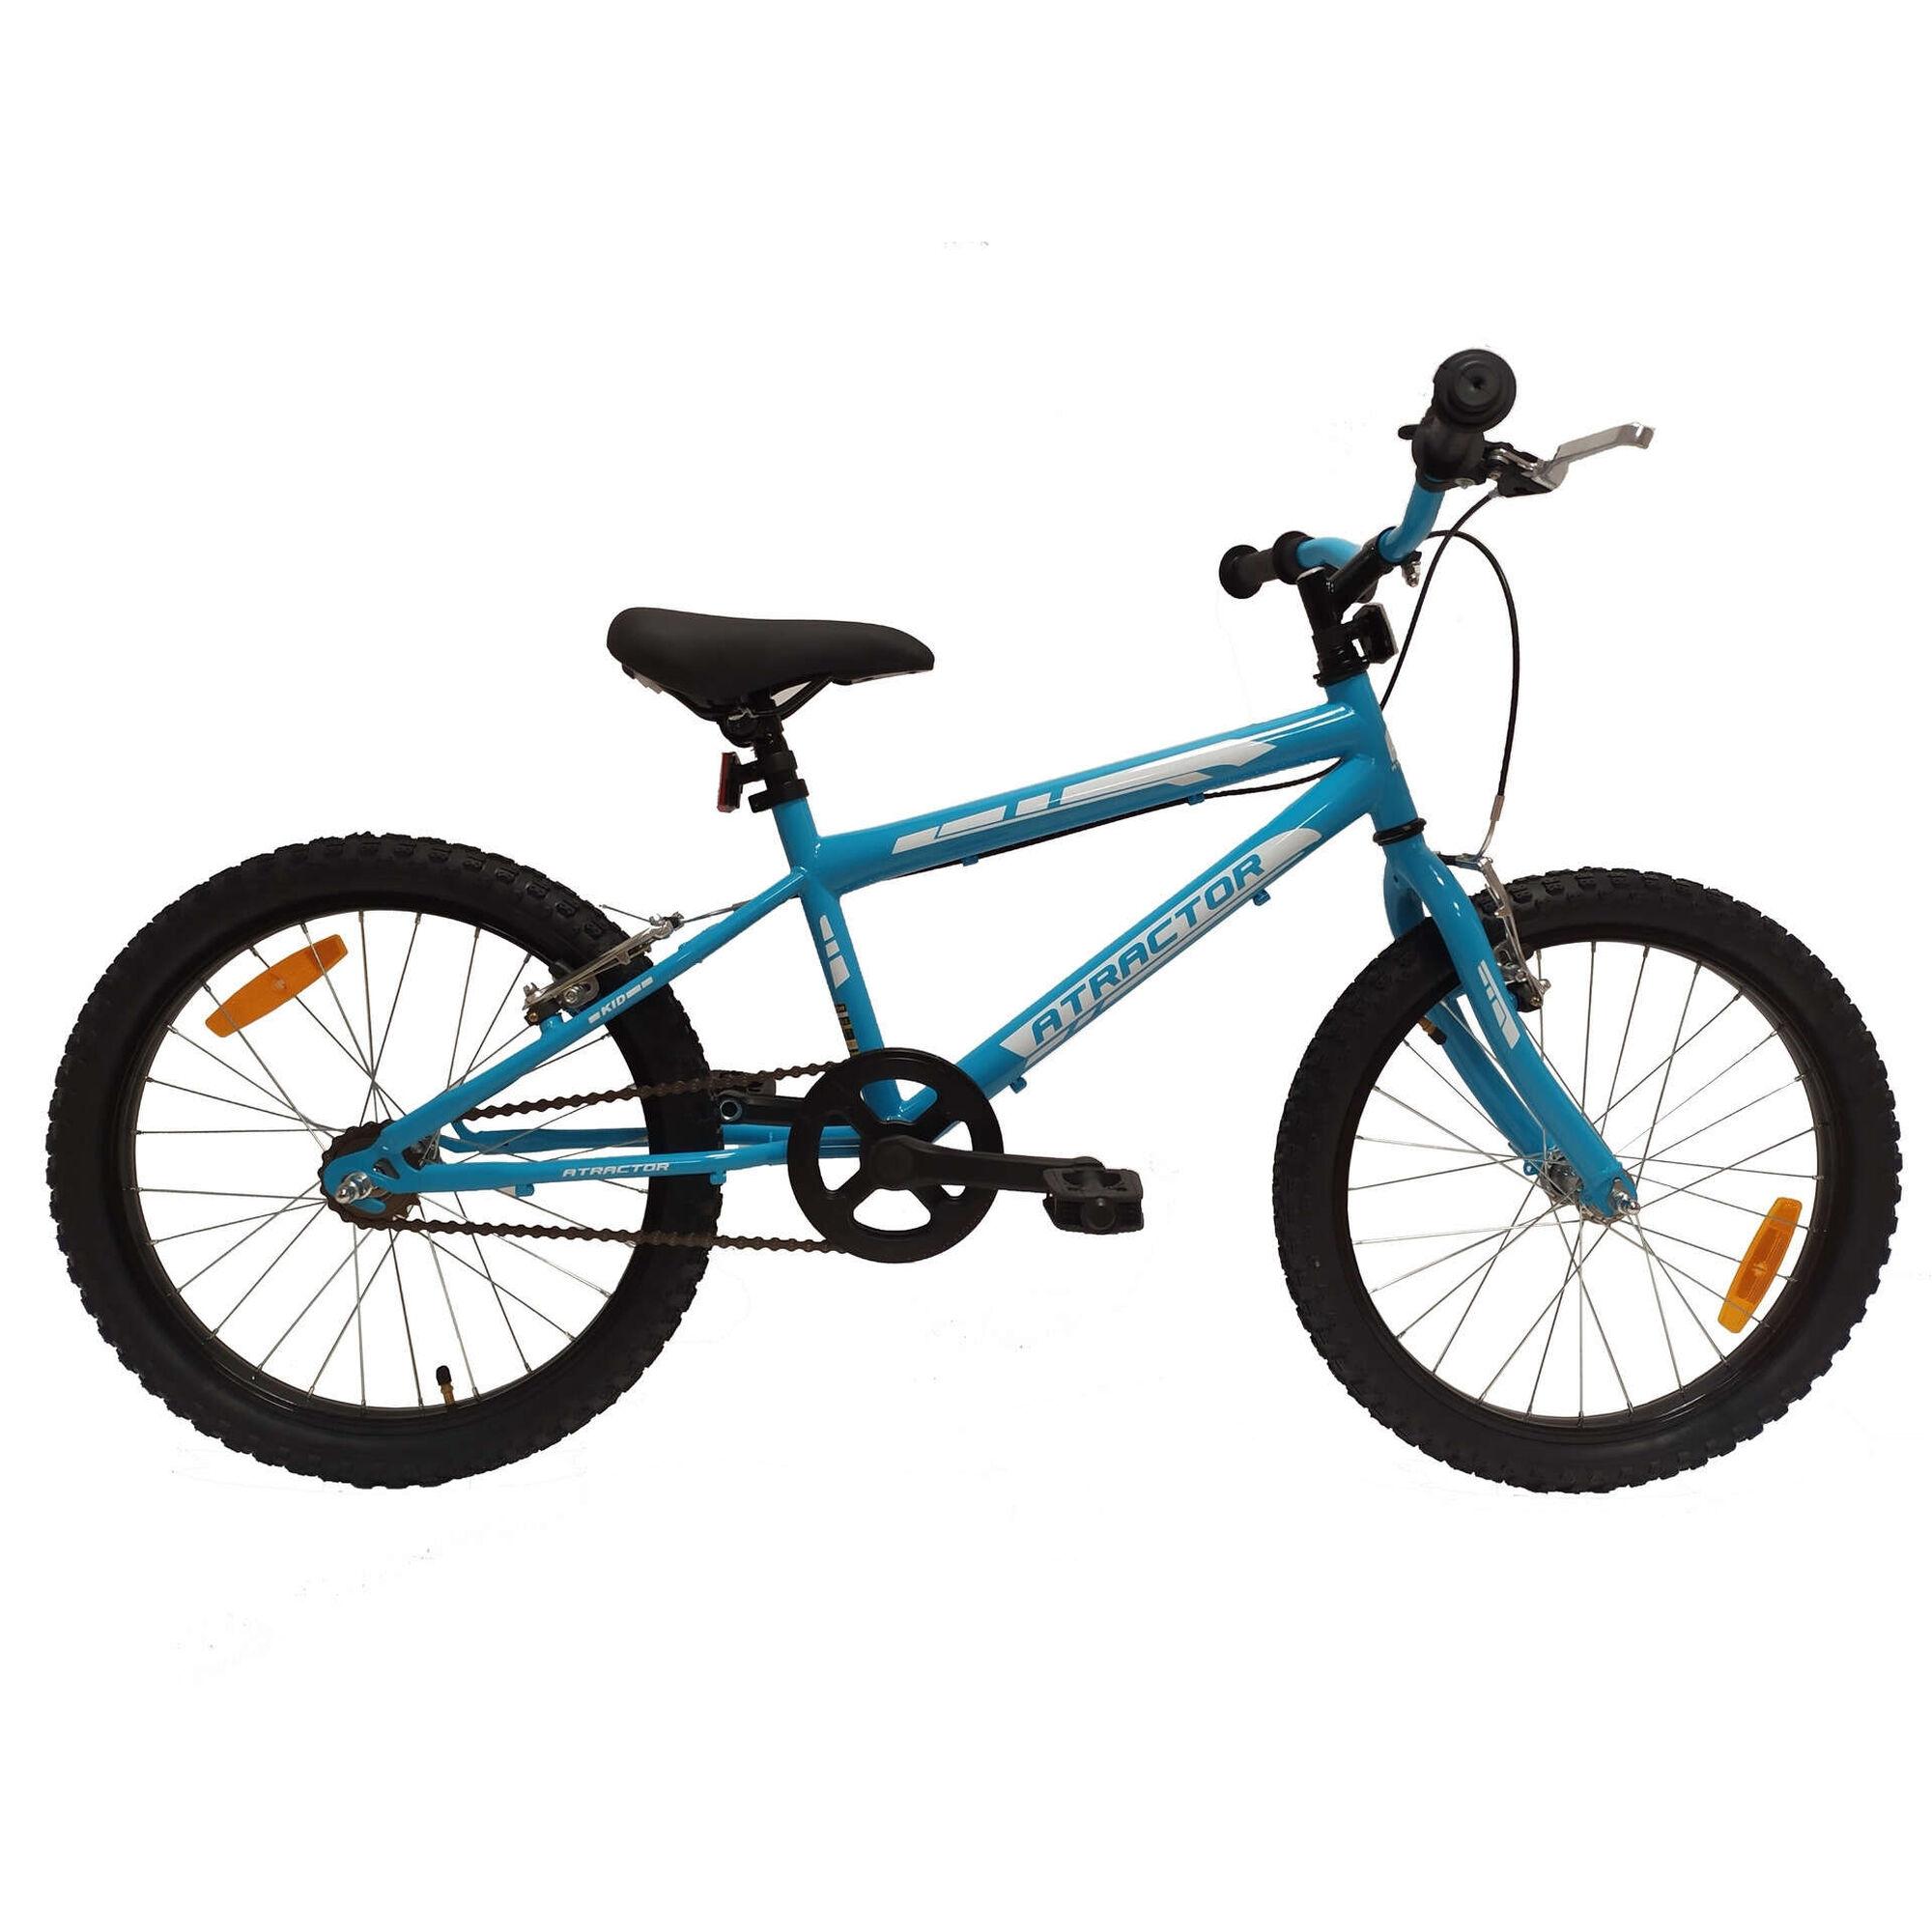 Bicicleta Júnior Roda 20'' 7-9 Anos Azul